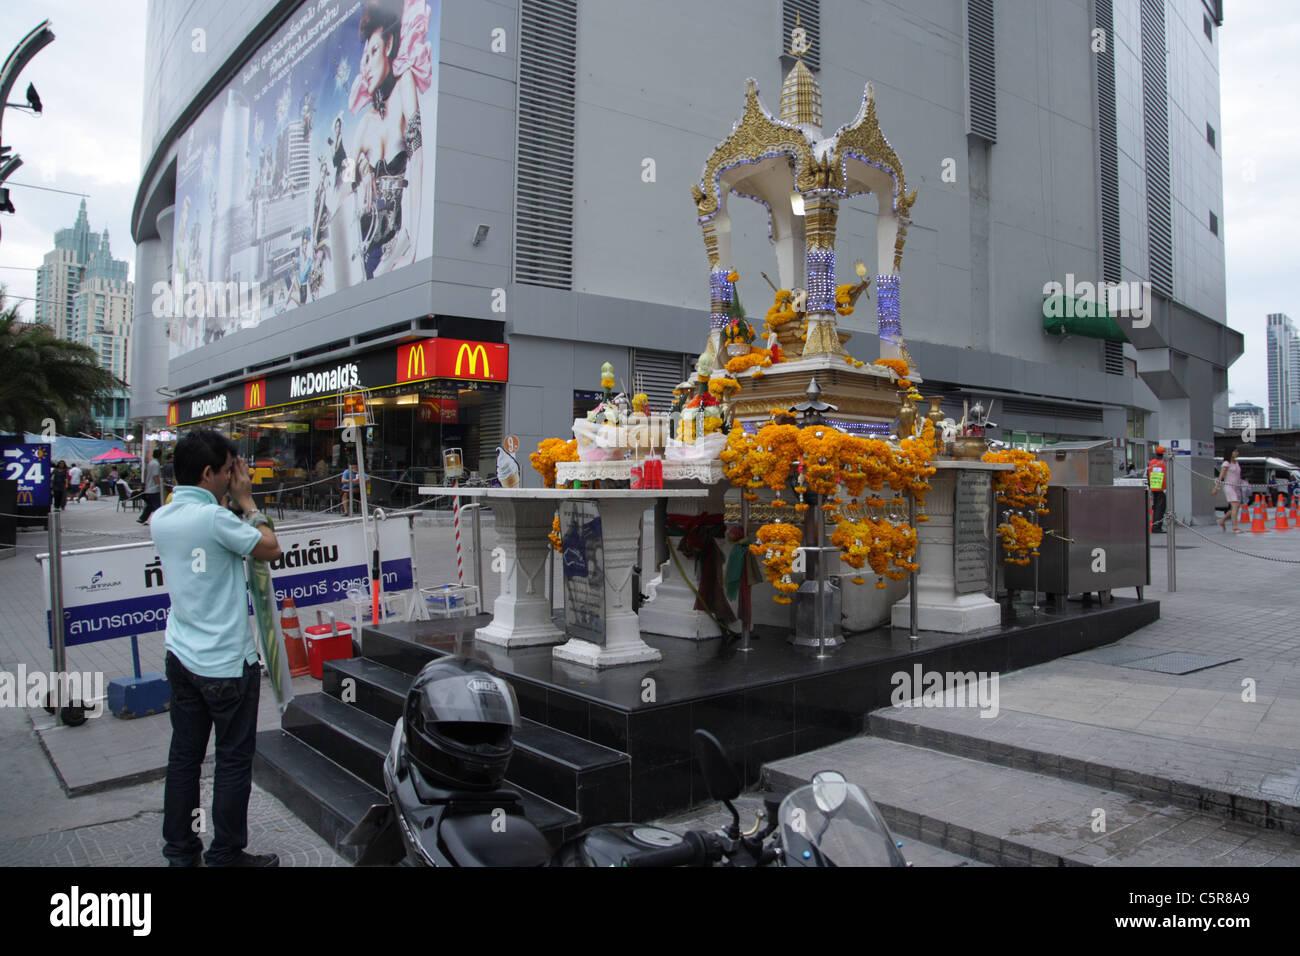 A man preying at spirit house shrine near shopping mall - Stock Image